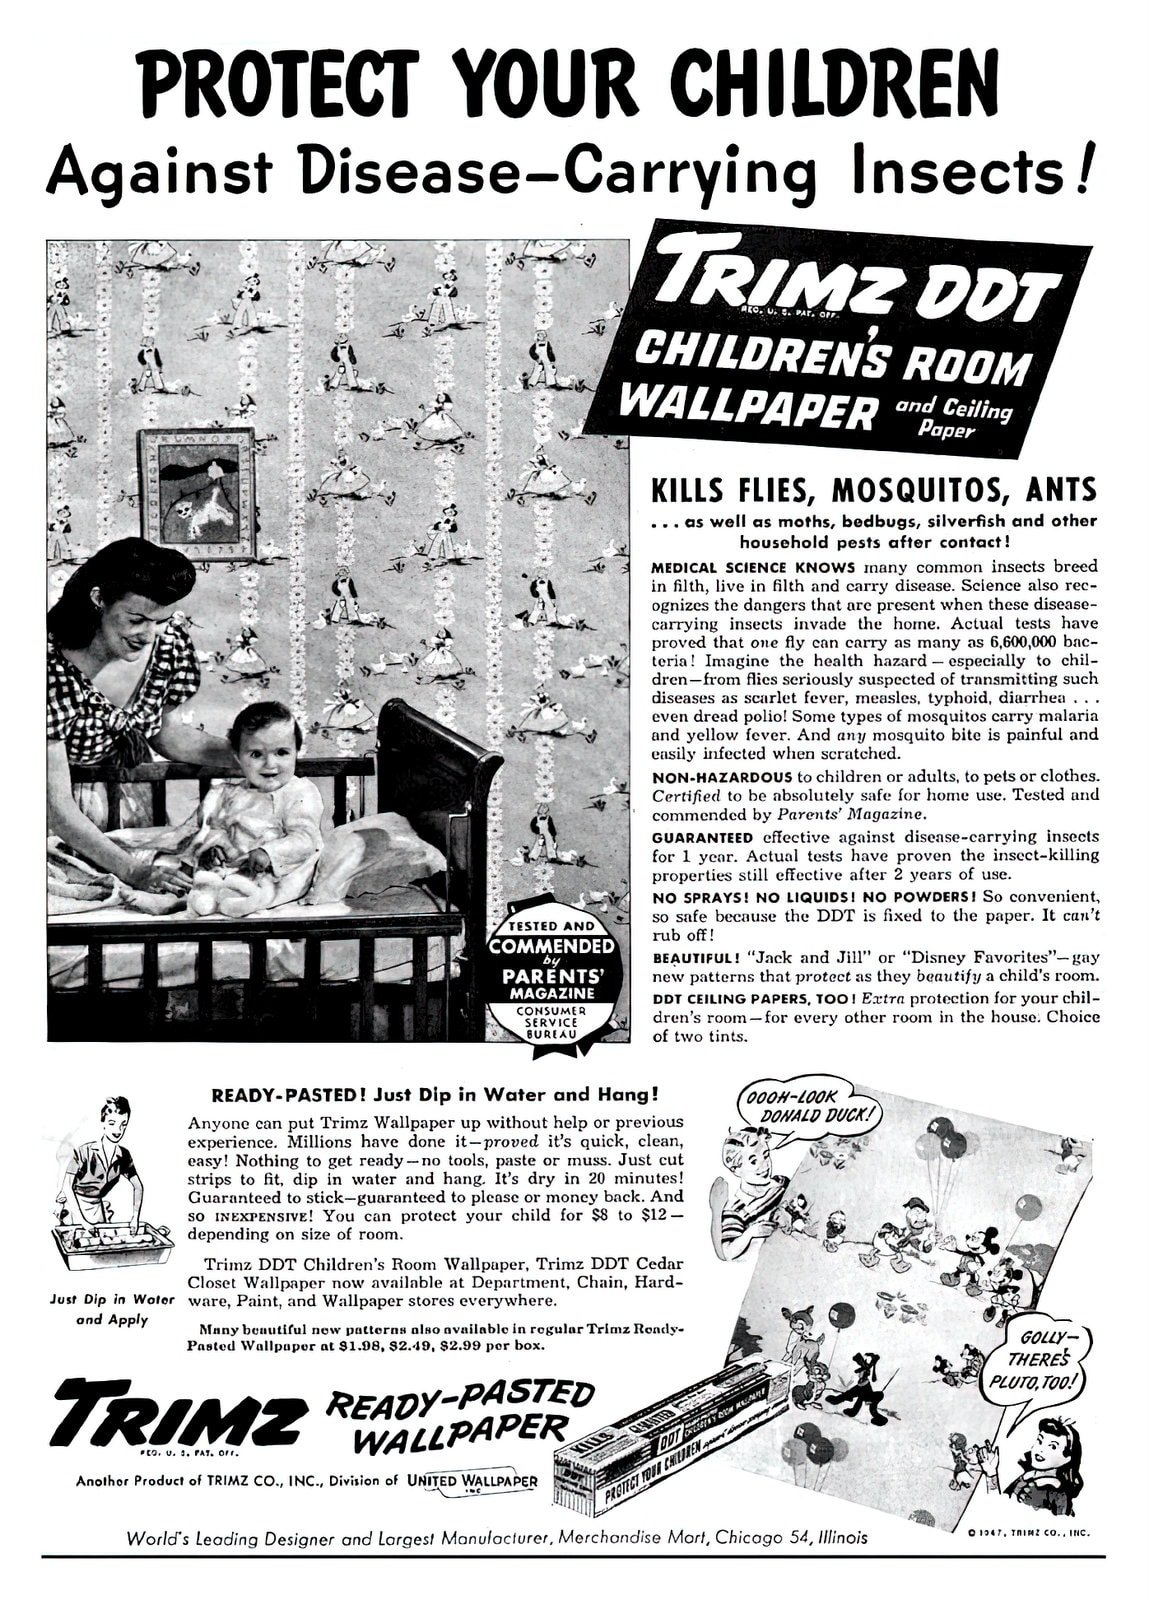 Vintage Trimz DDT wallpaper